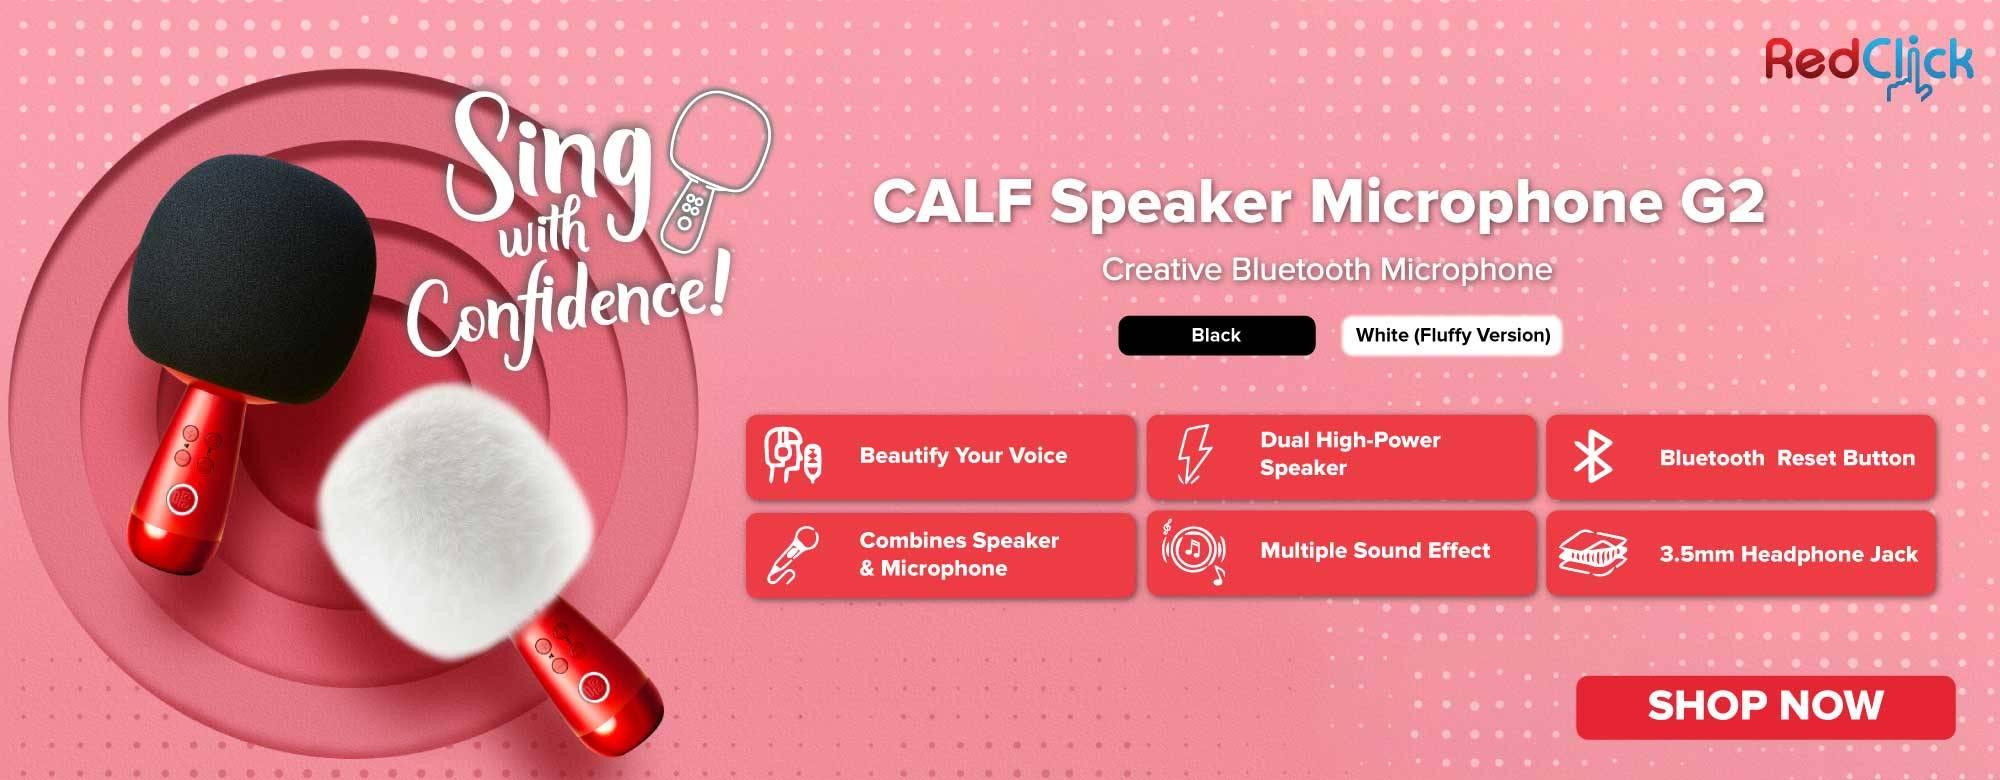 CALF Speaker Microphones G2